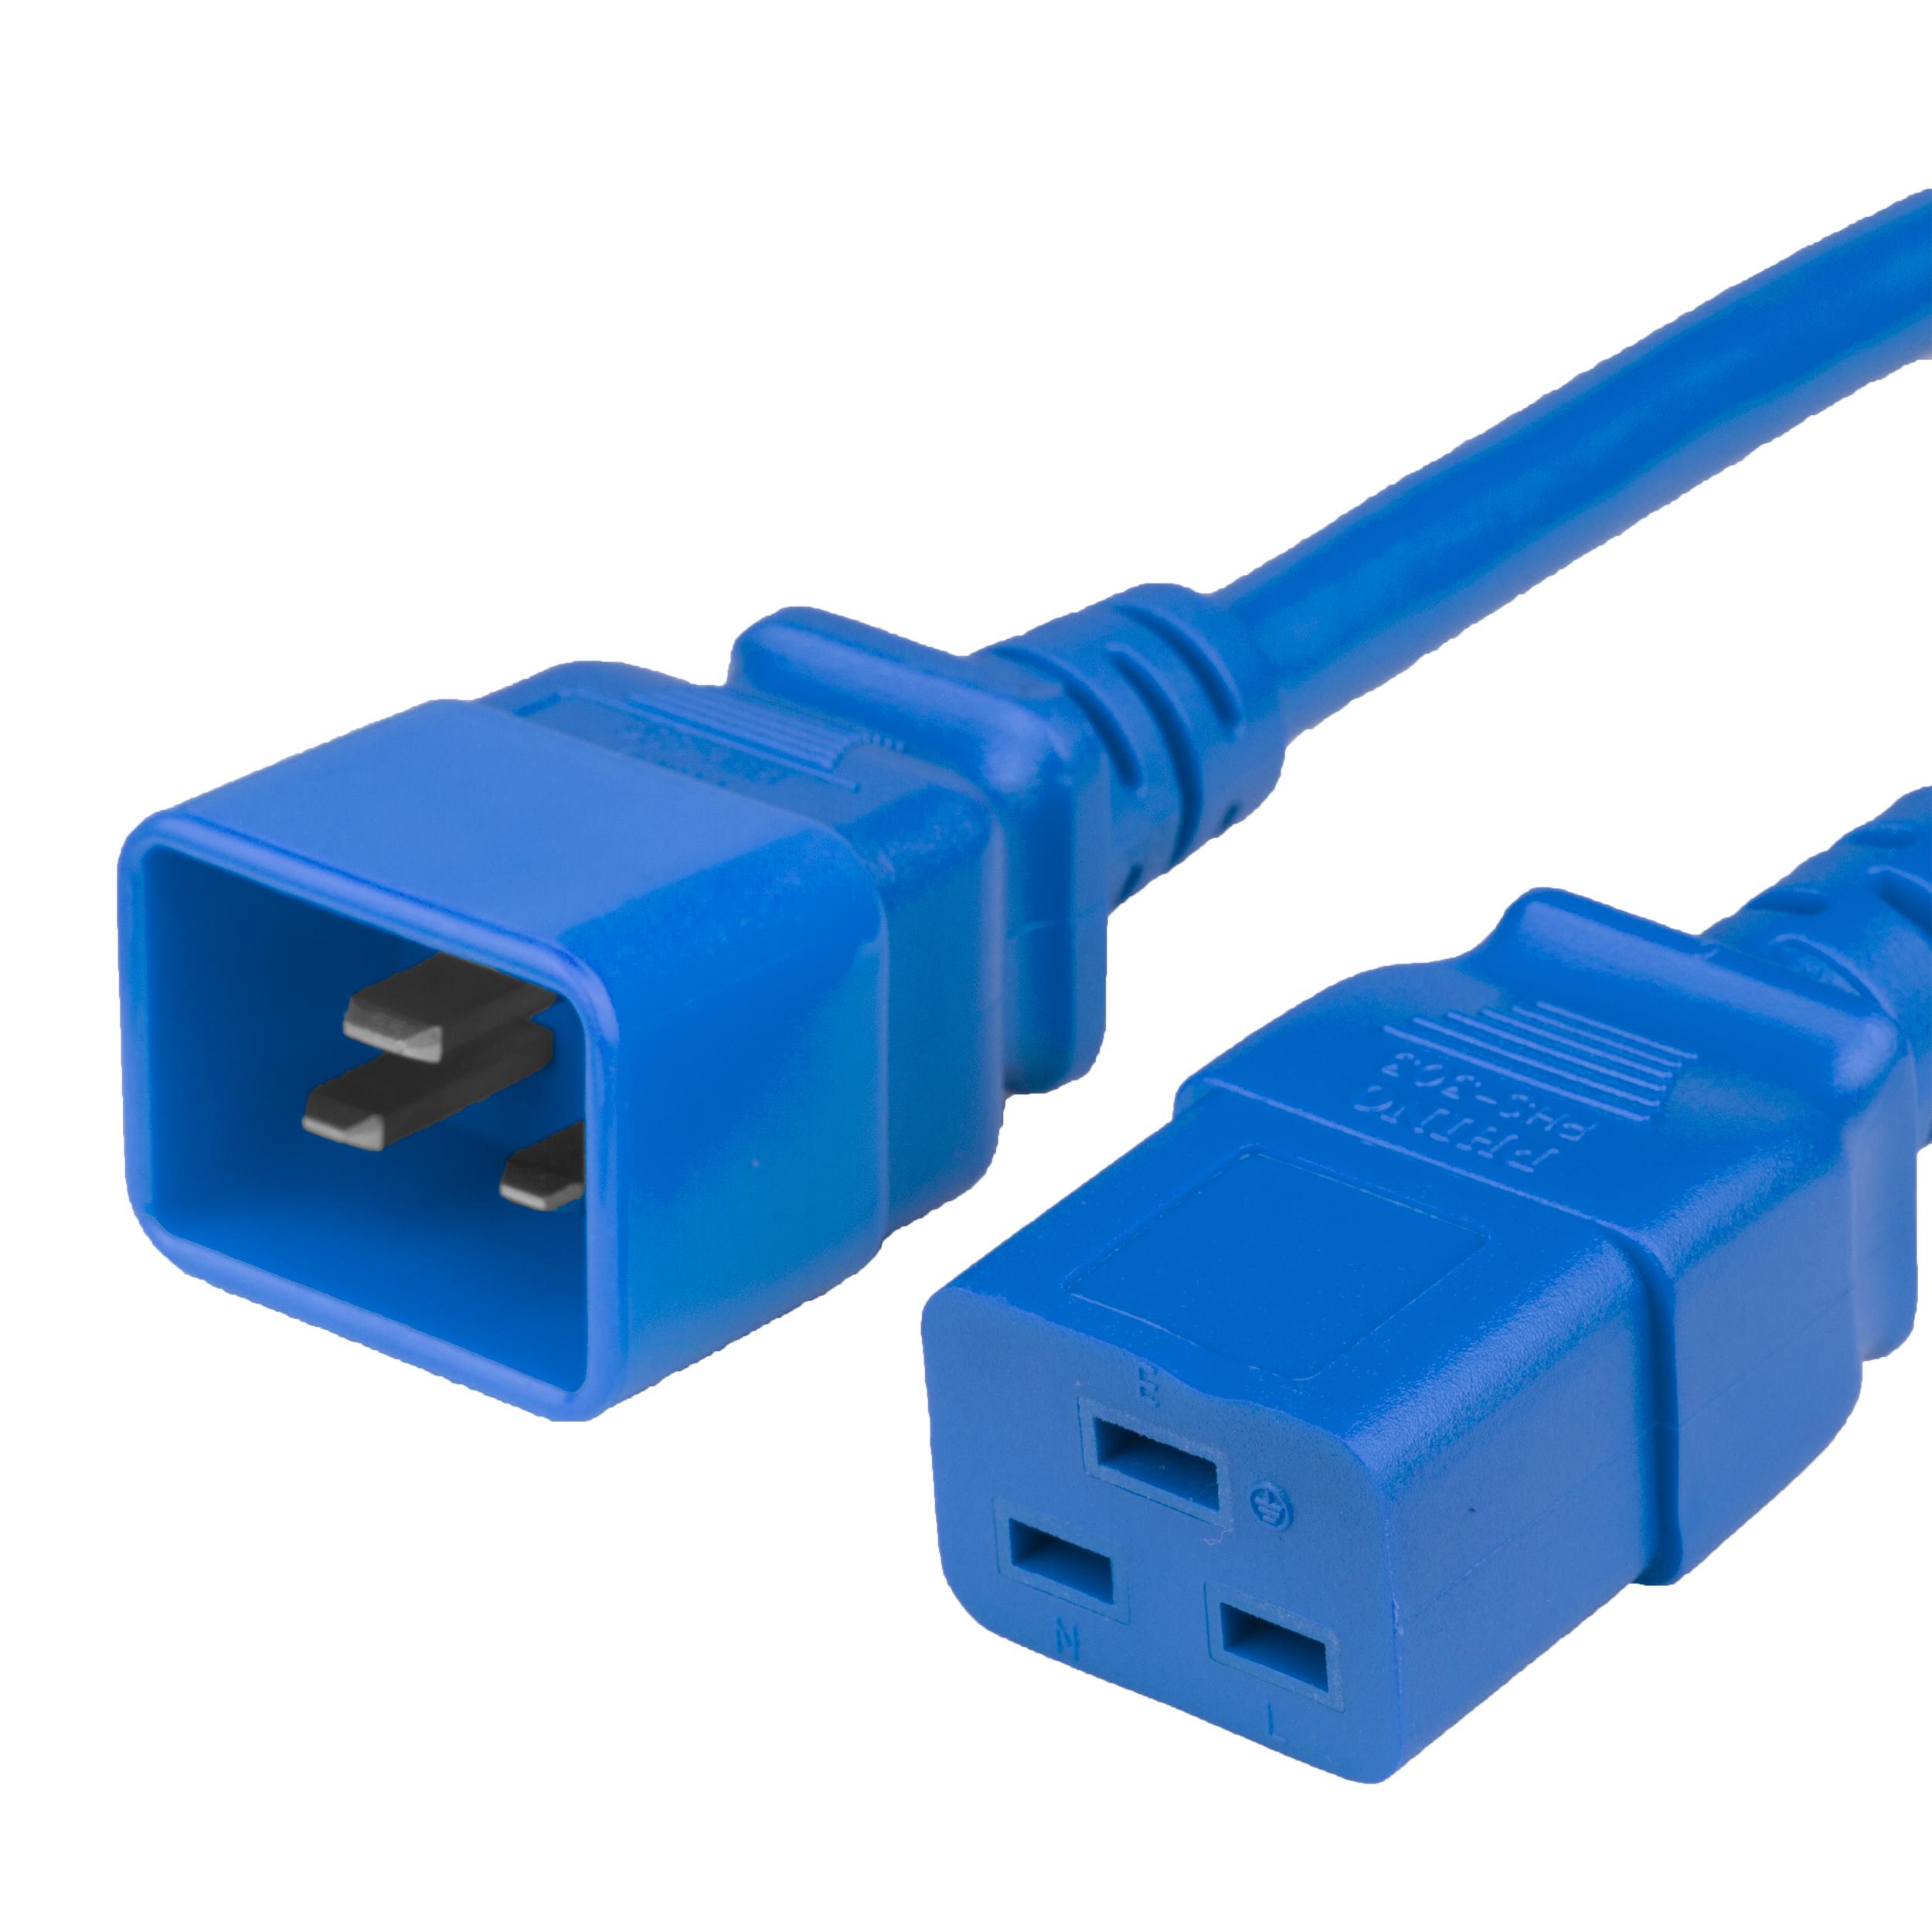 1.5FT C19 C20 20A 250V BLUE Power Cord